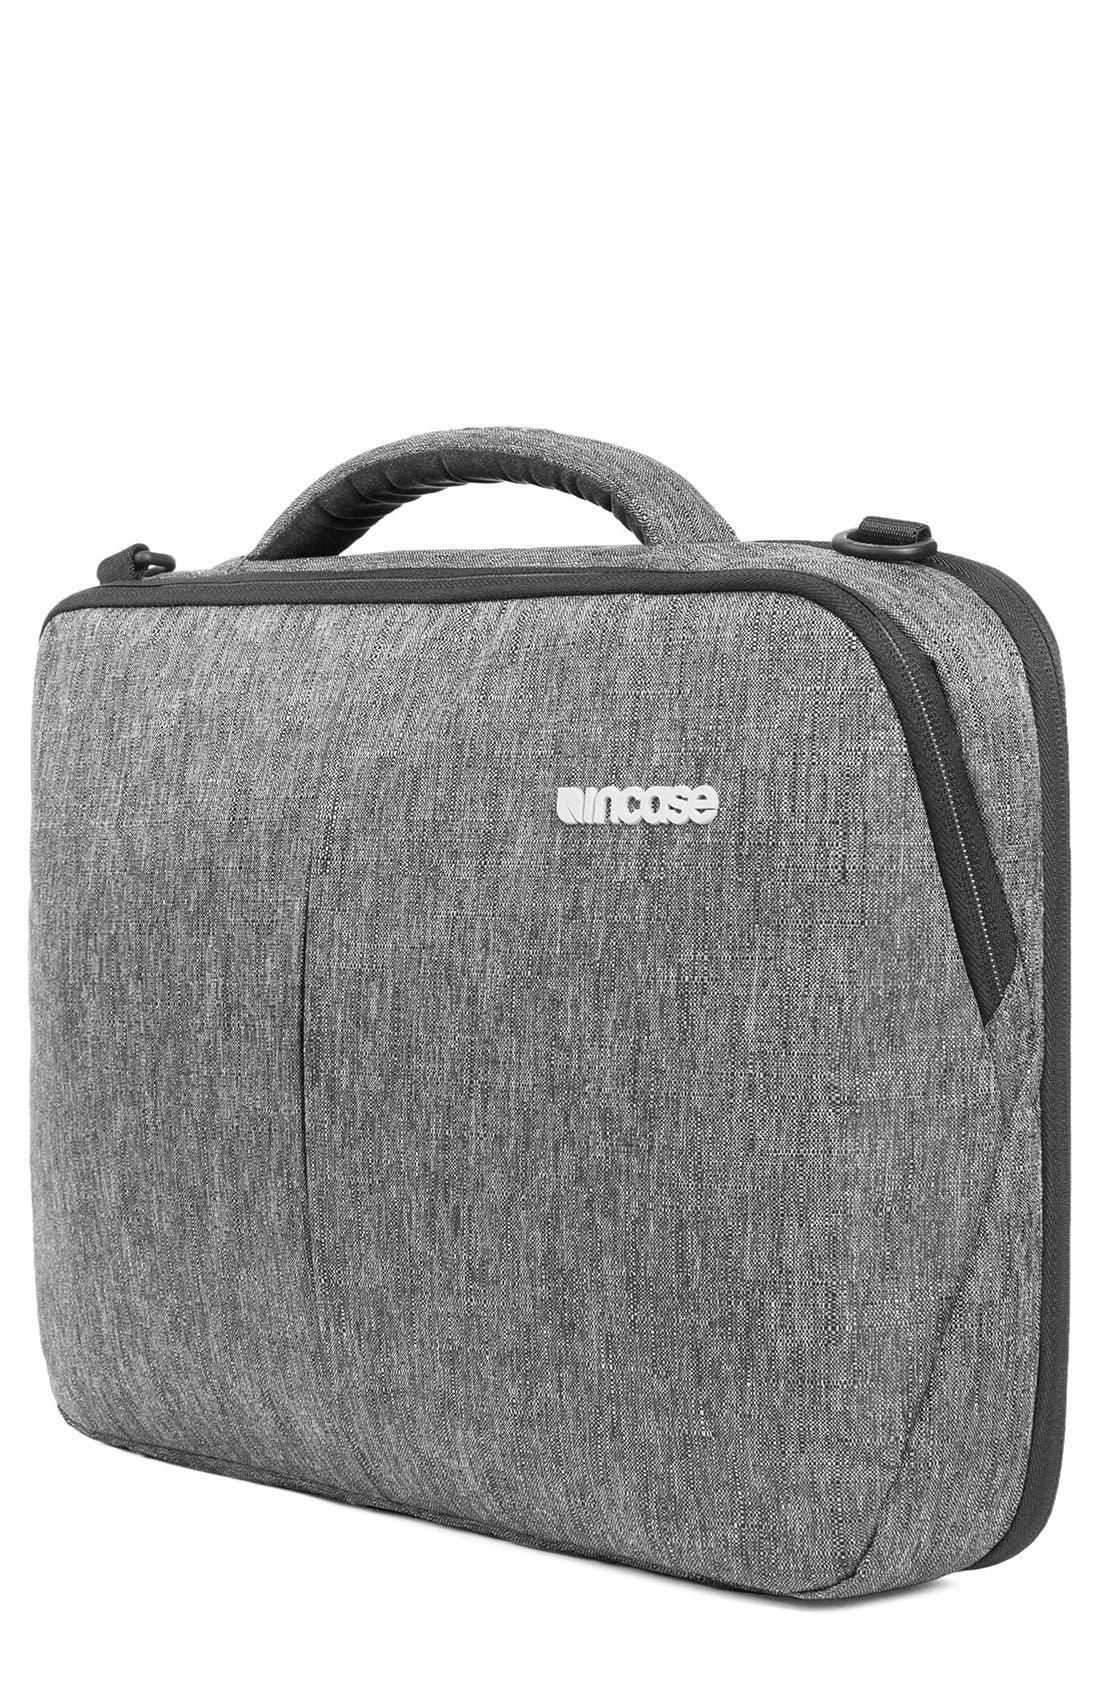 "'Reform' 13"" Laptop Briefcase,                         Main,                         color, 004"